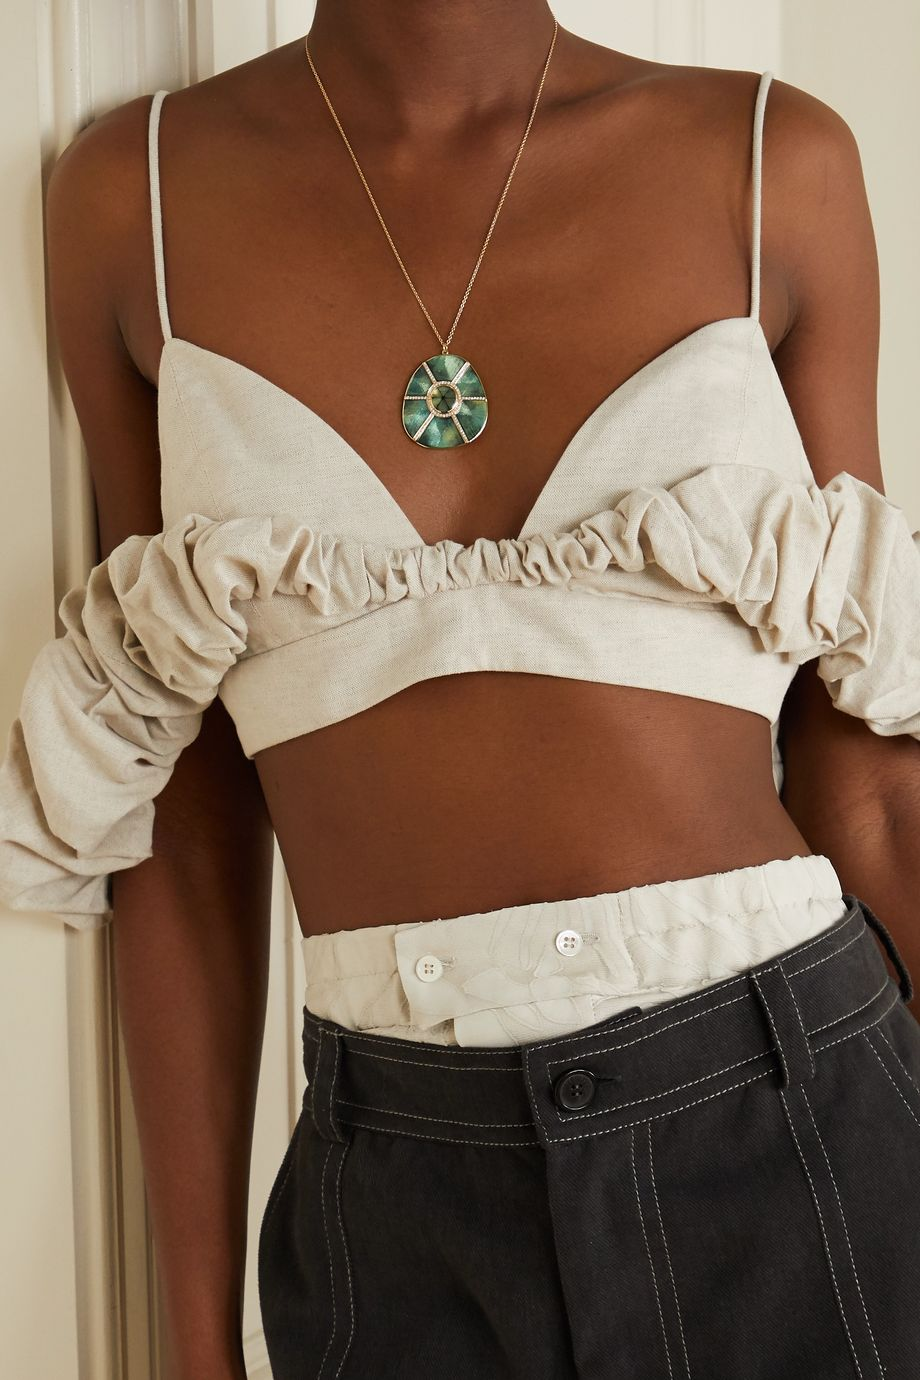 Brooke Gregson Mandala Trapiche 18-karat gold, enamel, emerald and diamond necklace